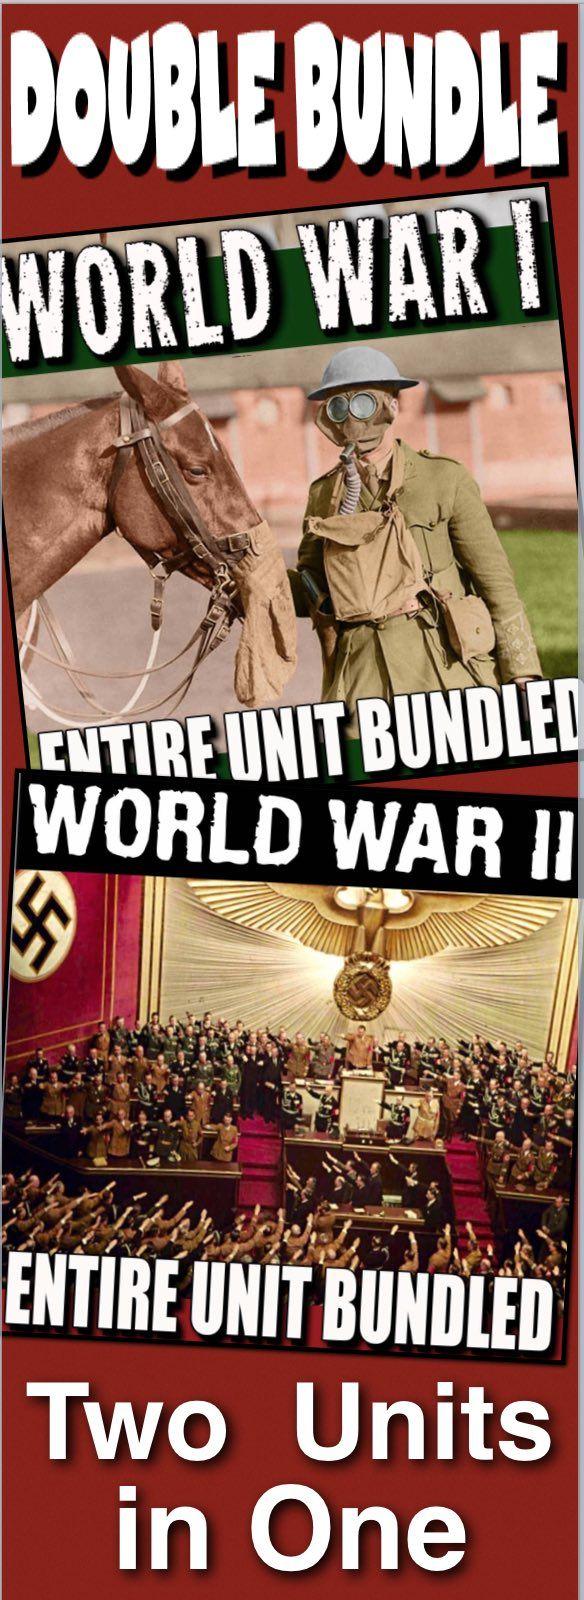 best 25 world war ideas on pinterest world war ii war and ww1 timeline. Black Bedroom Furniture Sets. Home Design Ideas